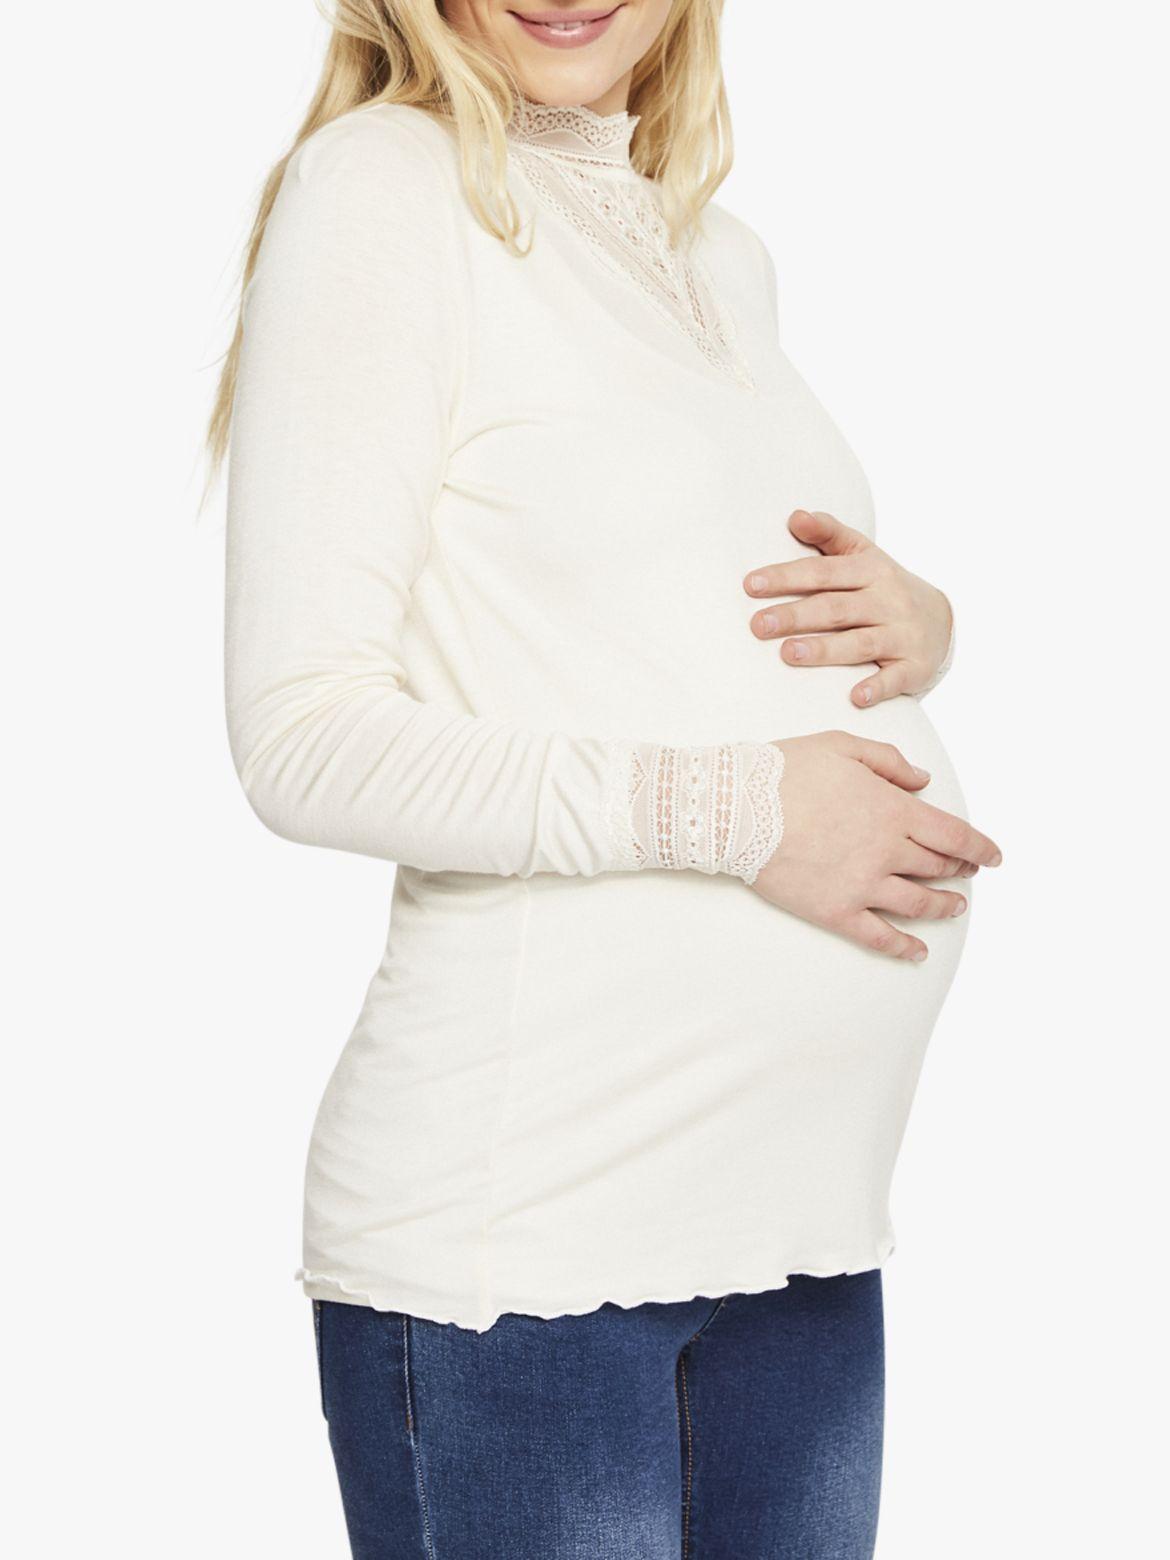 Mamalicious Mamalicious Reese Long Sleeve Jersey Top, Whisper White